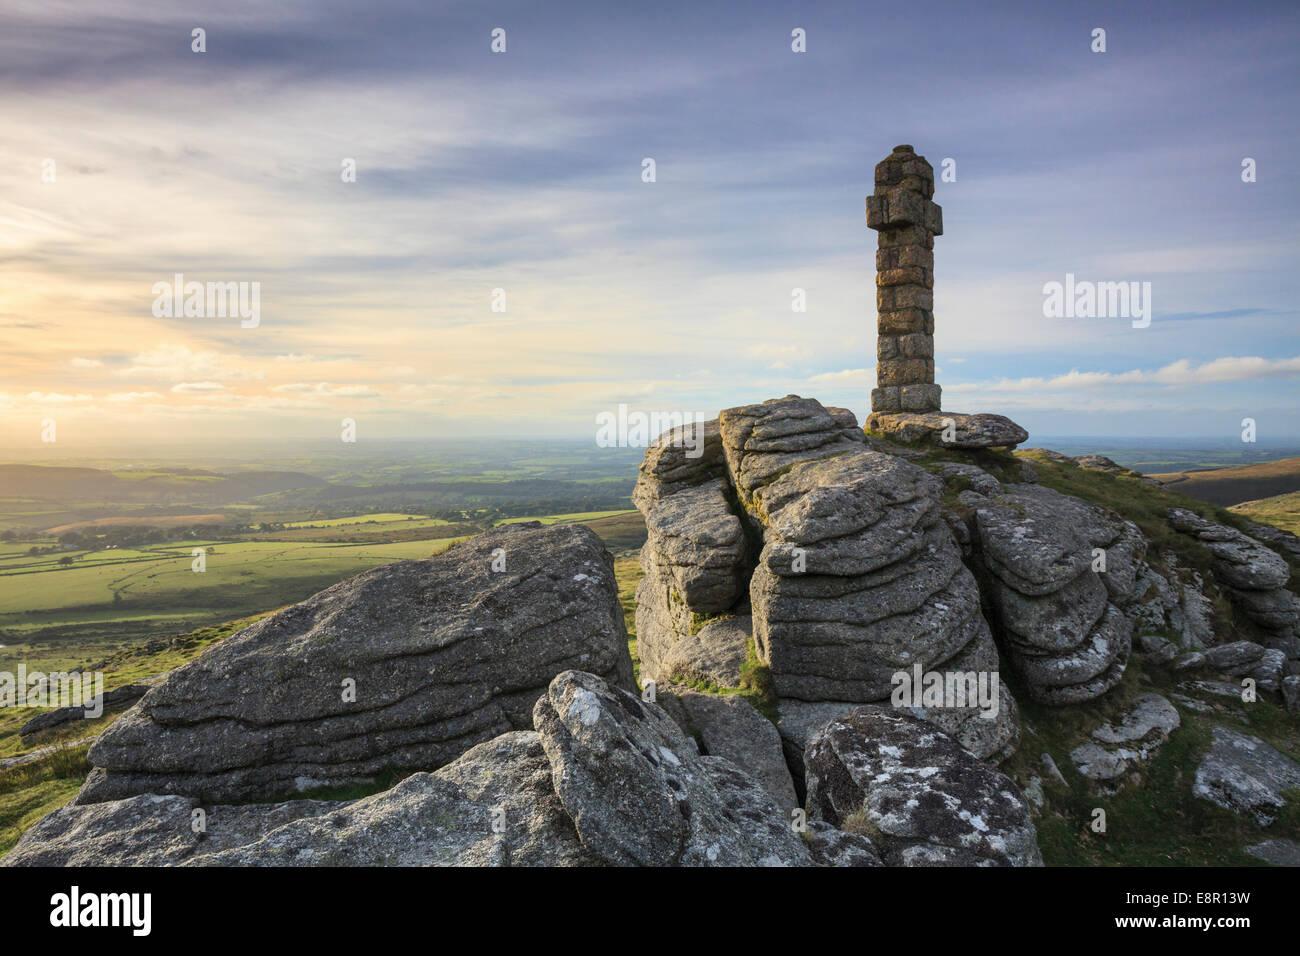 Widgery's Cross on the summit of Brat Tor in the Dartmoor National Park. - Stock Image